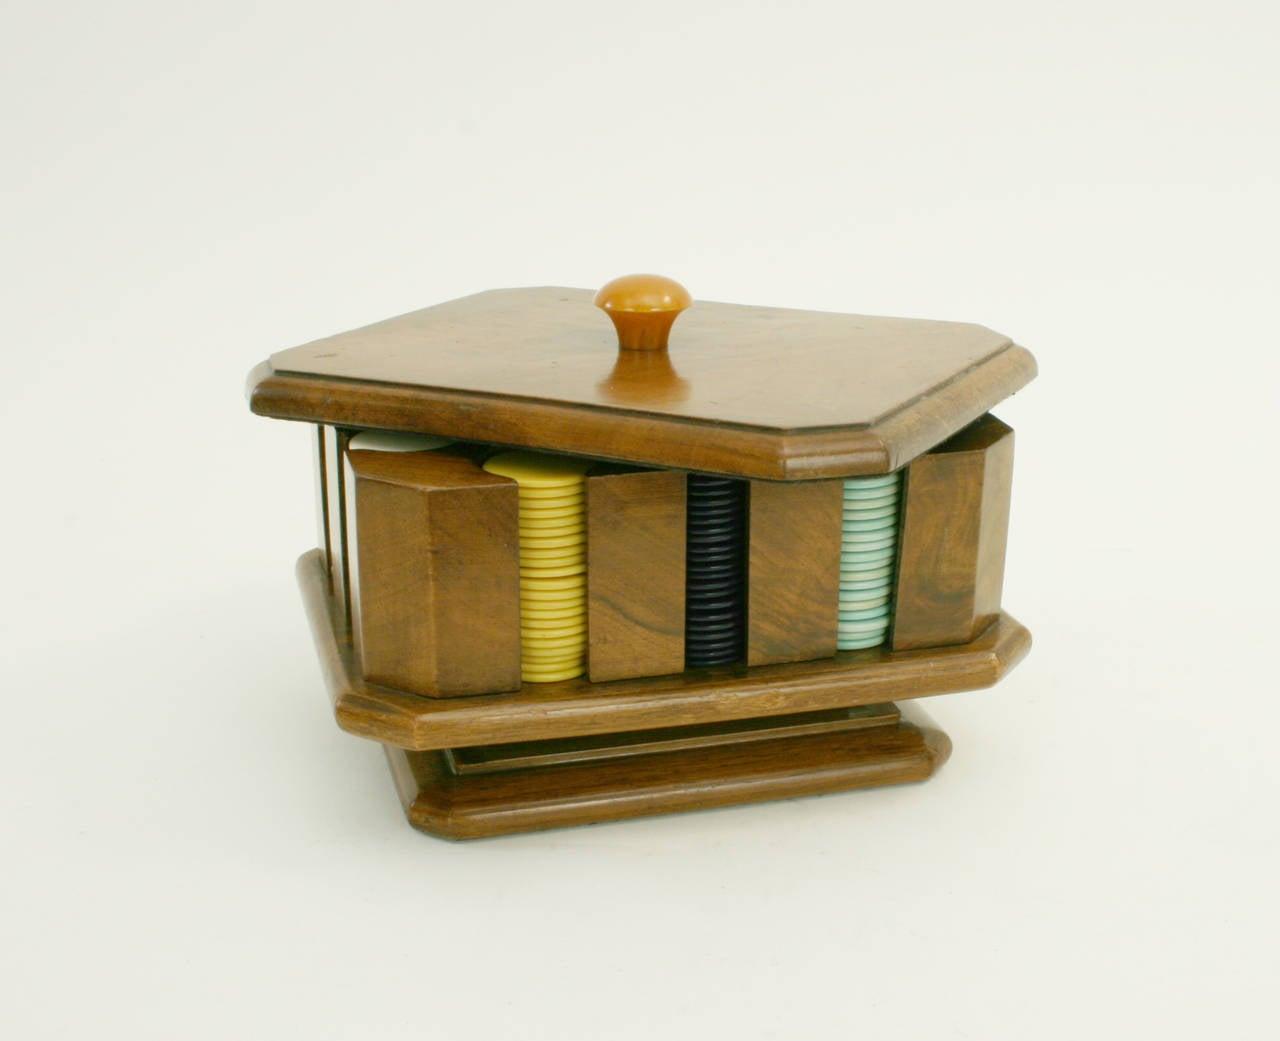 Antique poker chips identification